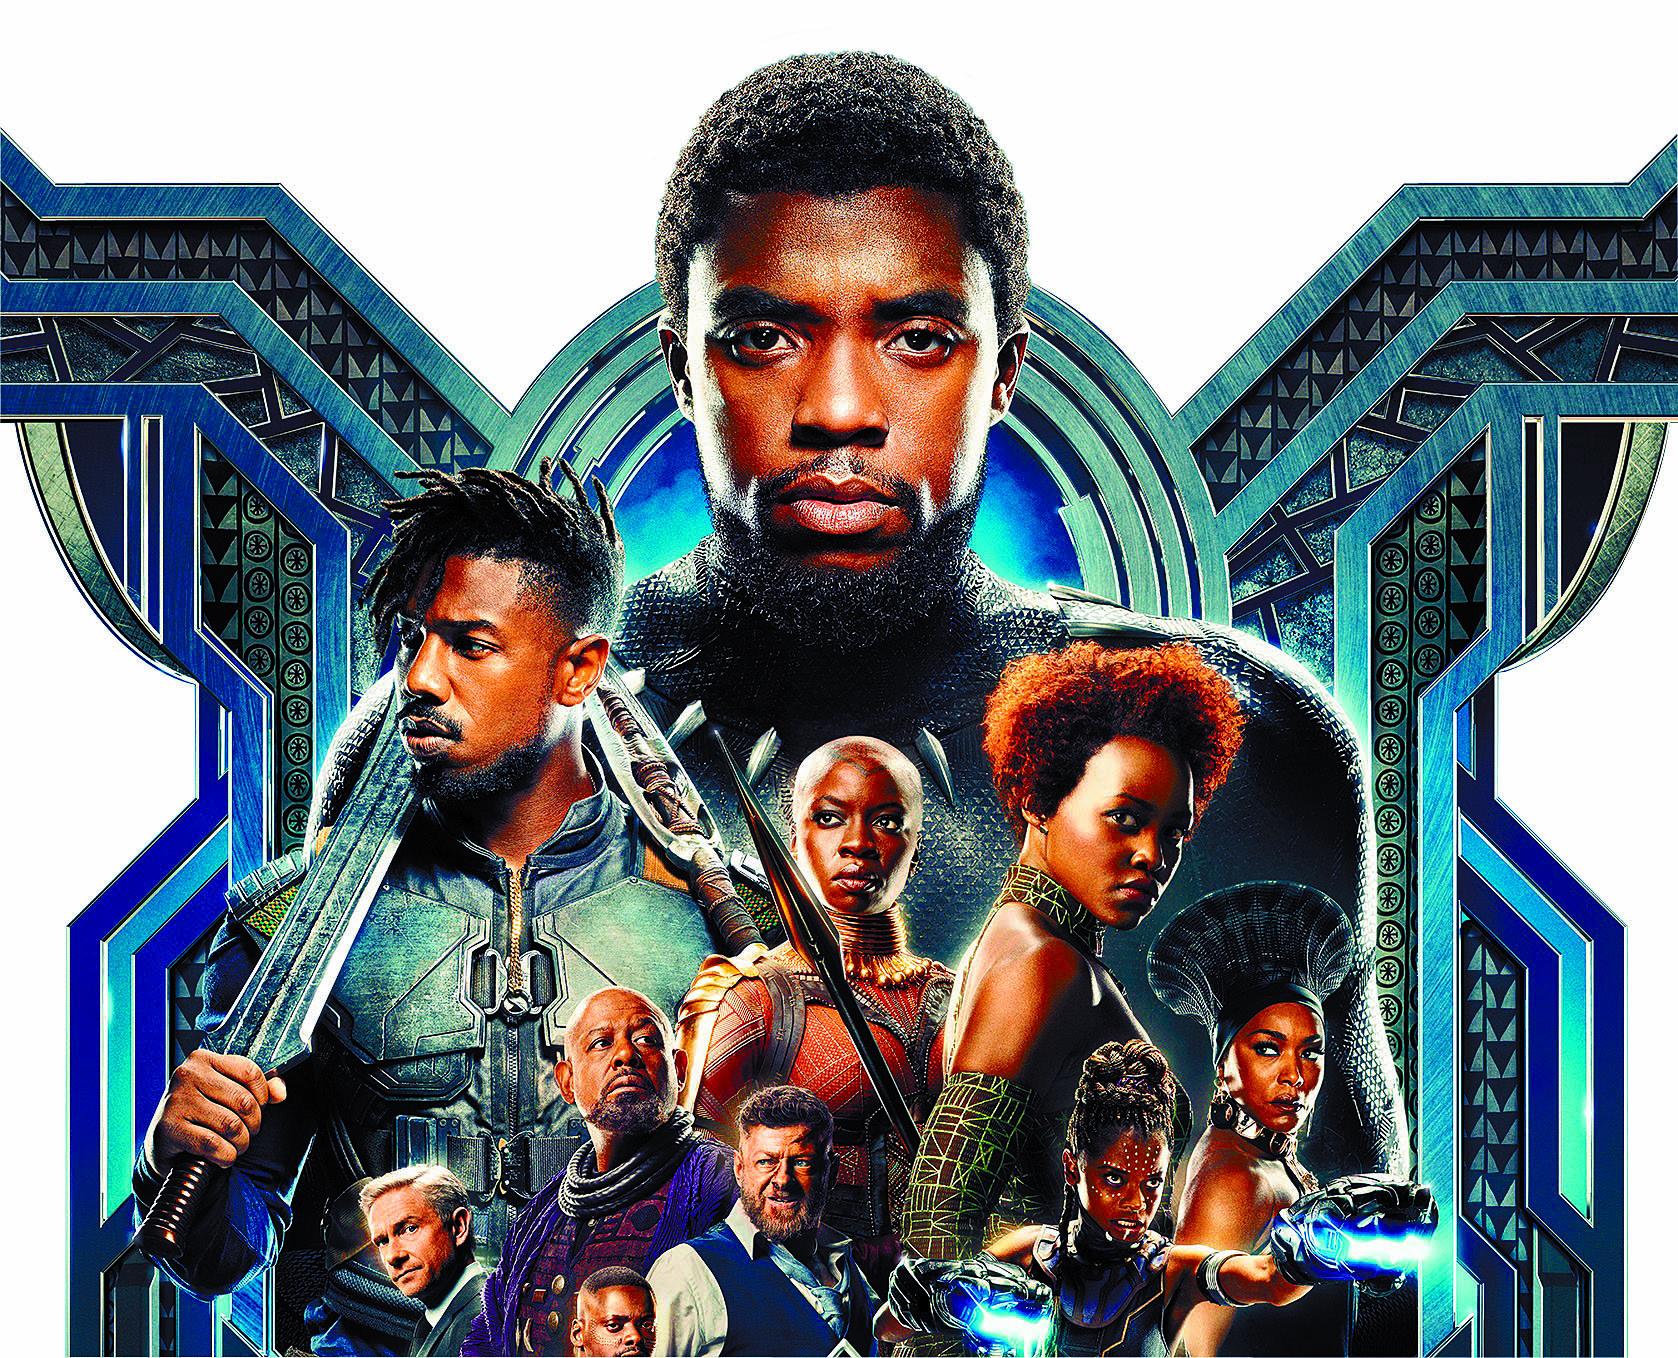 Lupita Nyong'o habla sobre su personaje en Black Panther